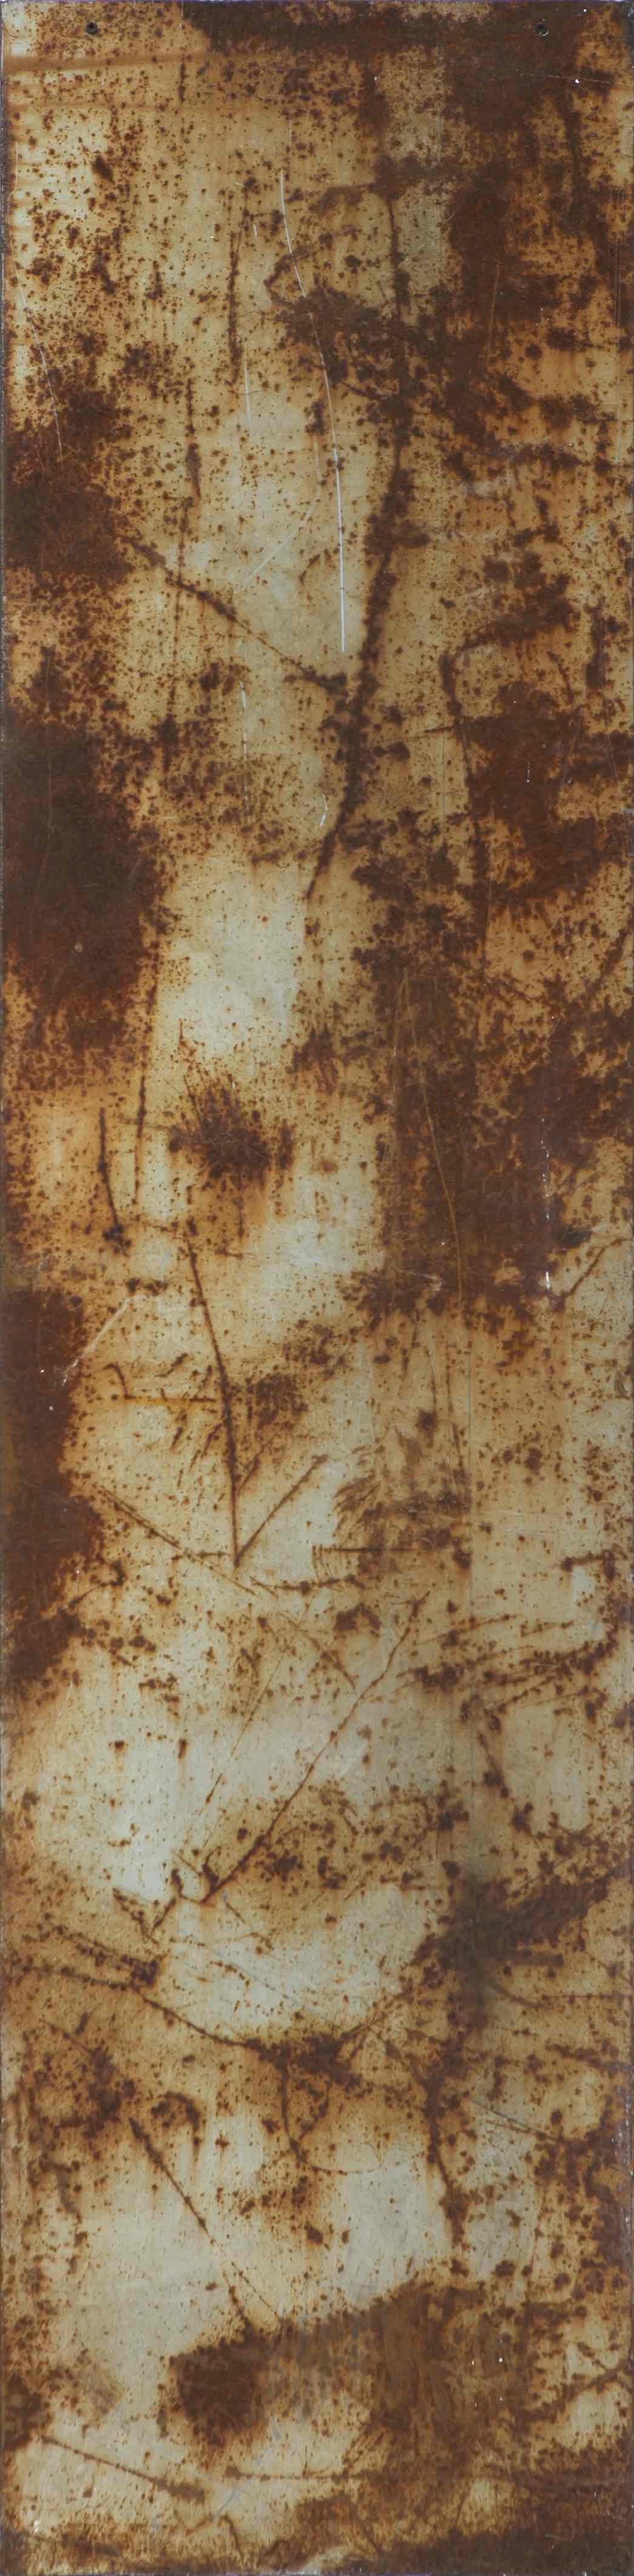 Stele n°6, ferro corroso su tavola, 168x42, 1998